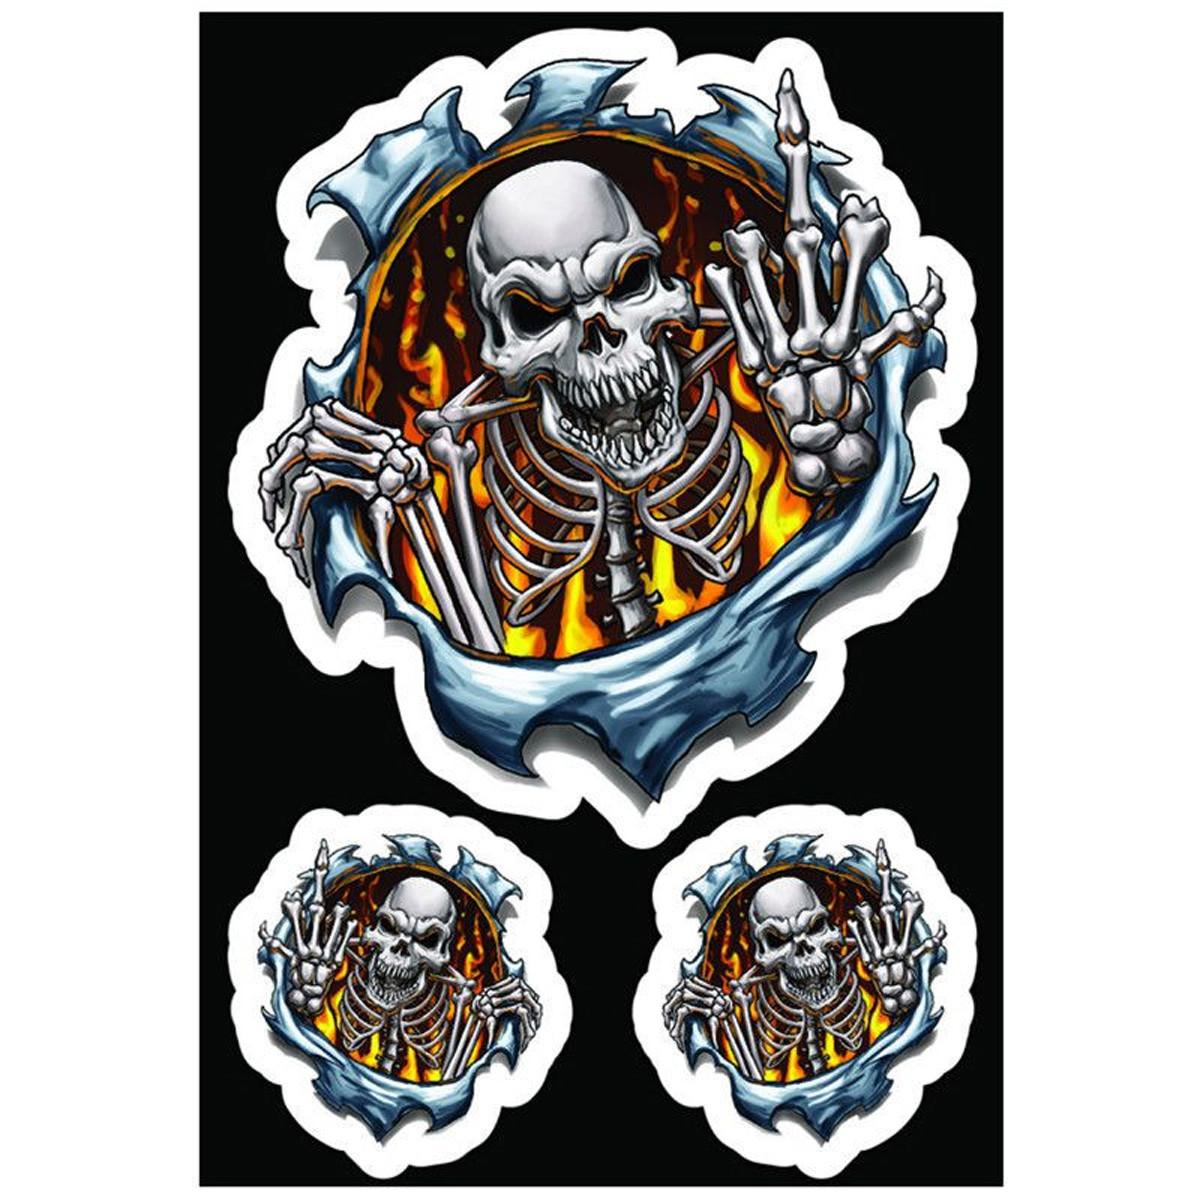 Autocollant / Sticker - LETHAL THREAT Finger Skull 7.5 x 14cm